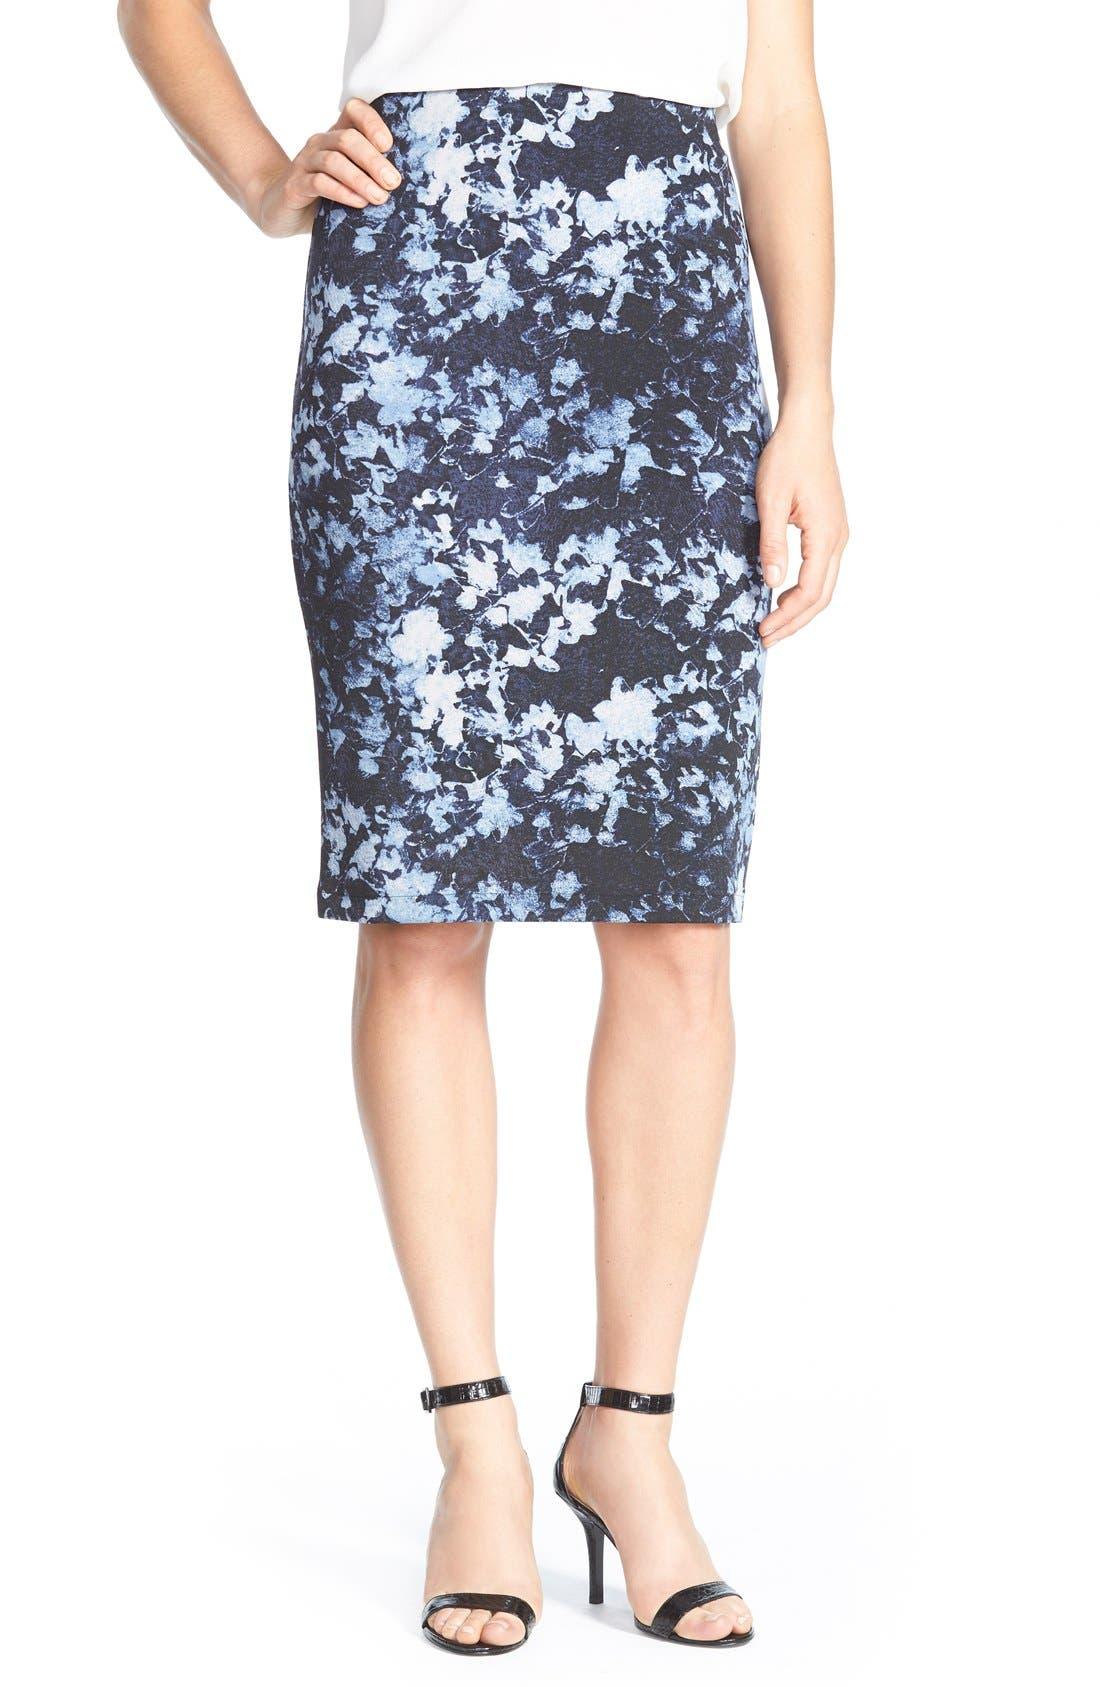 Alternate Image 1 Selected - Vince CamutoFloral Print Scuba Knit Pencil Skirt